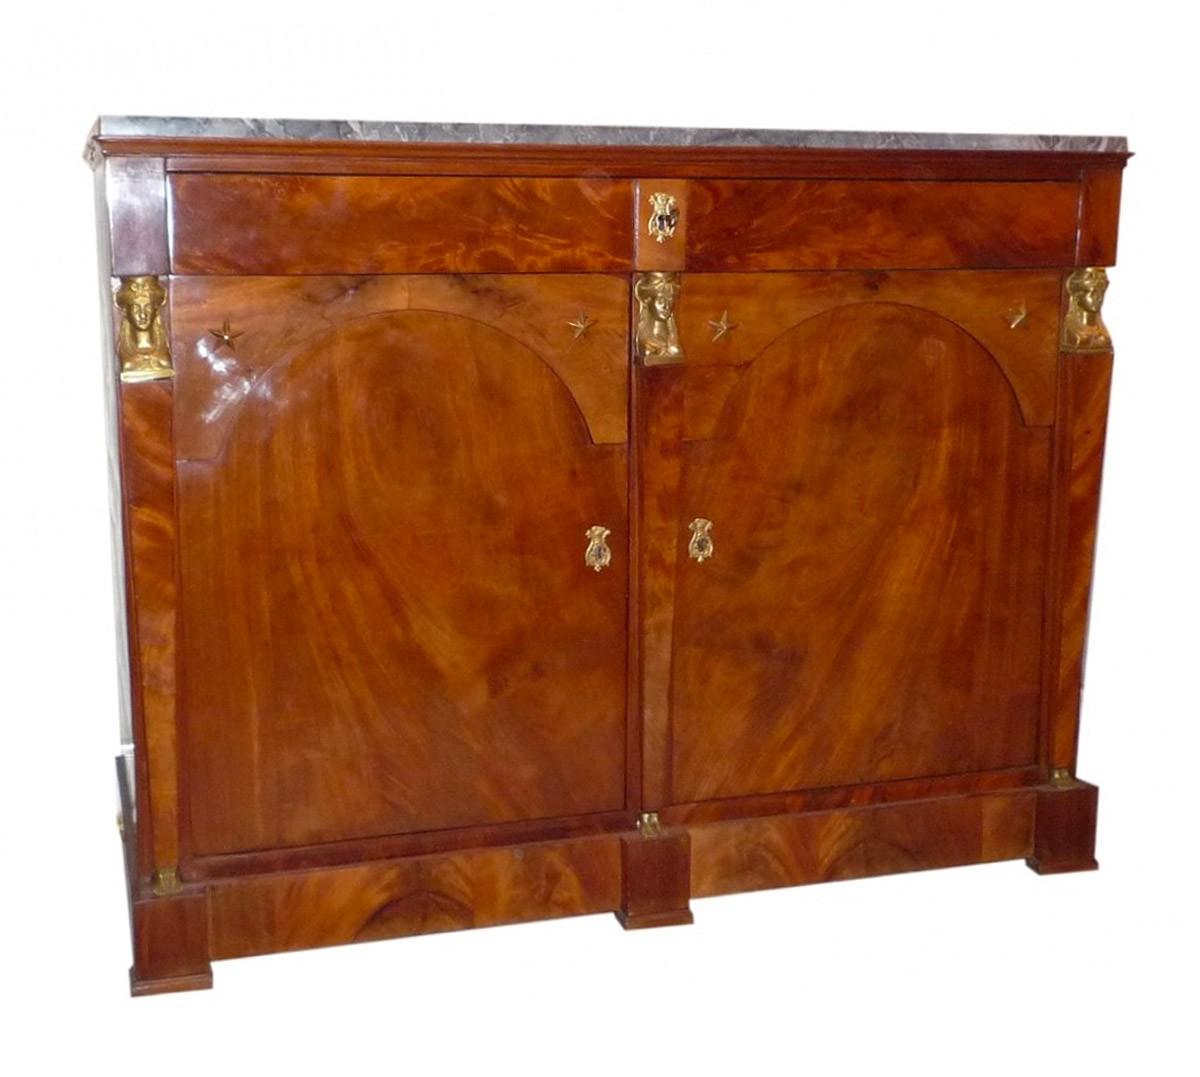 buffet en acajou deux portes poque empire estampill deman ain xixe si cle. Black Bedroom Furniture Sets. Home Design Ideas